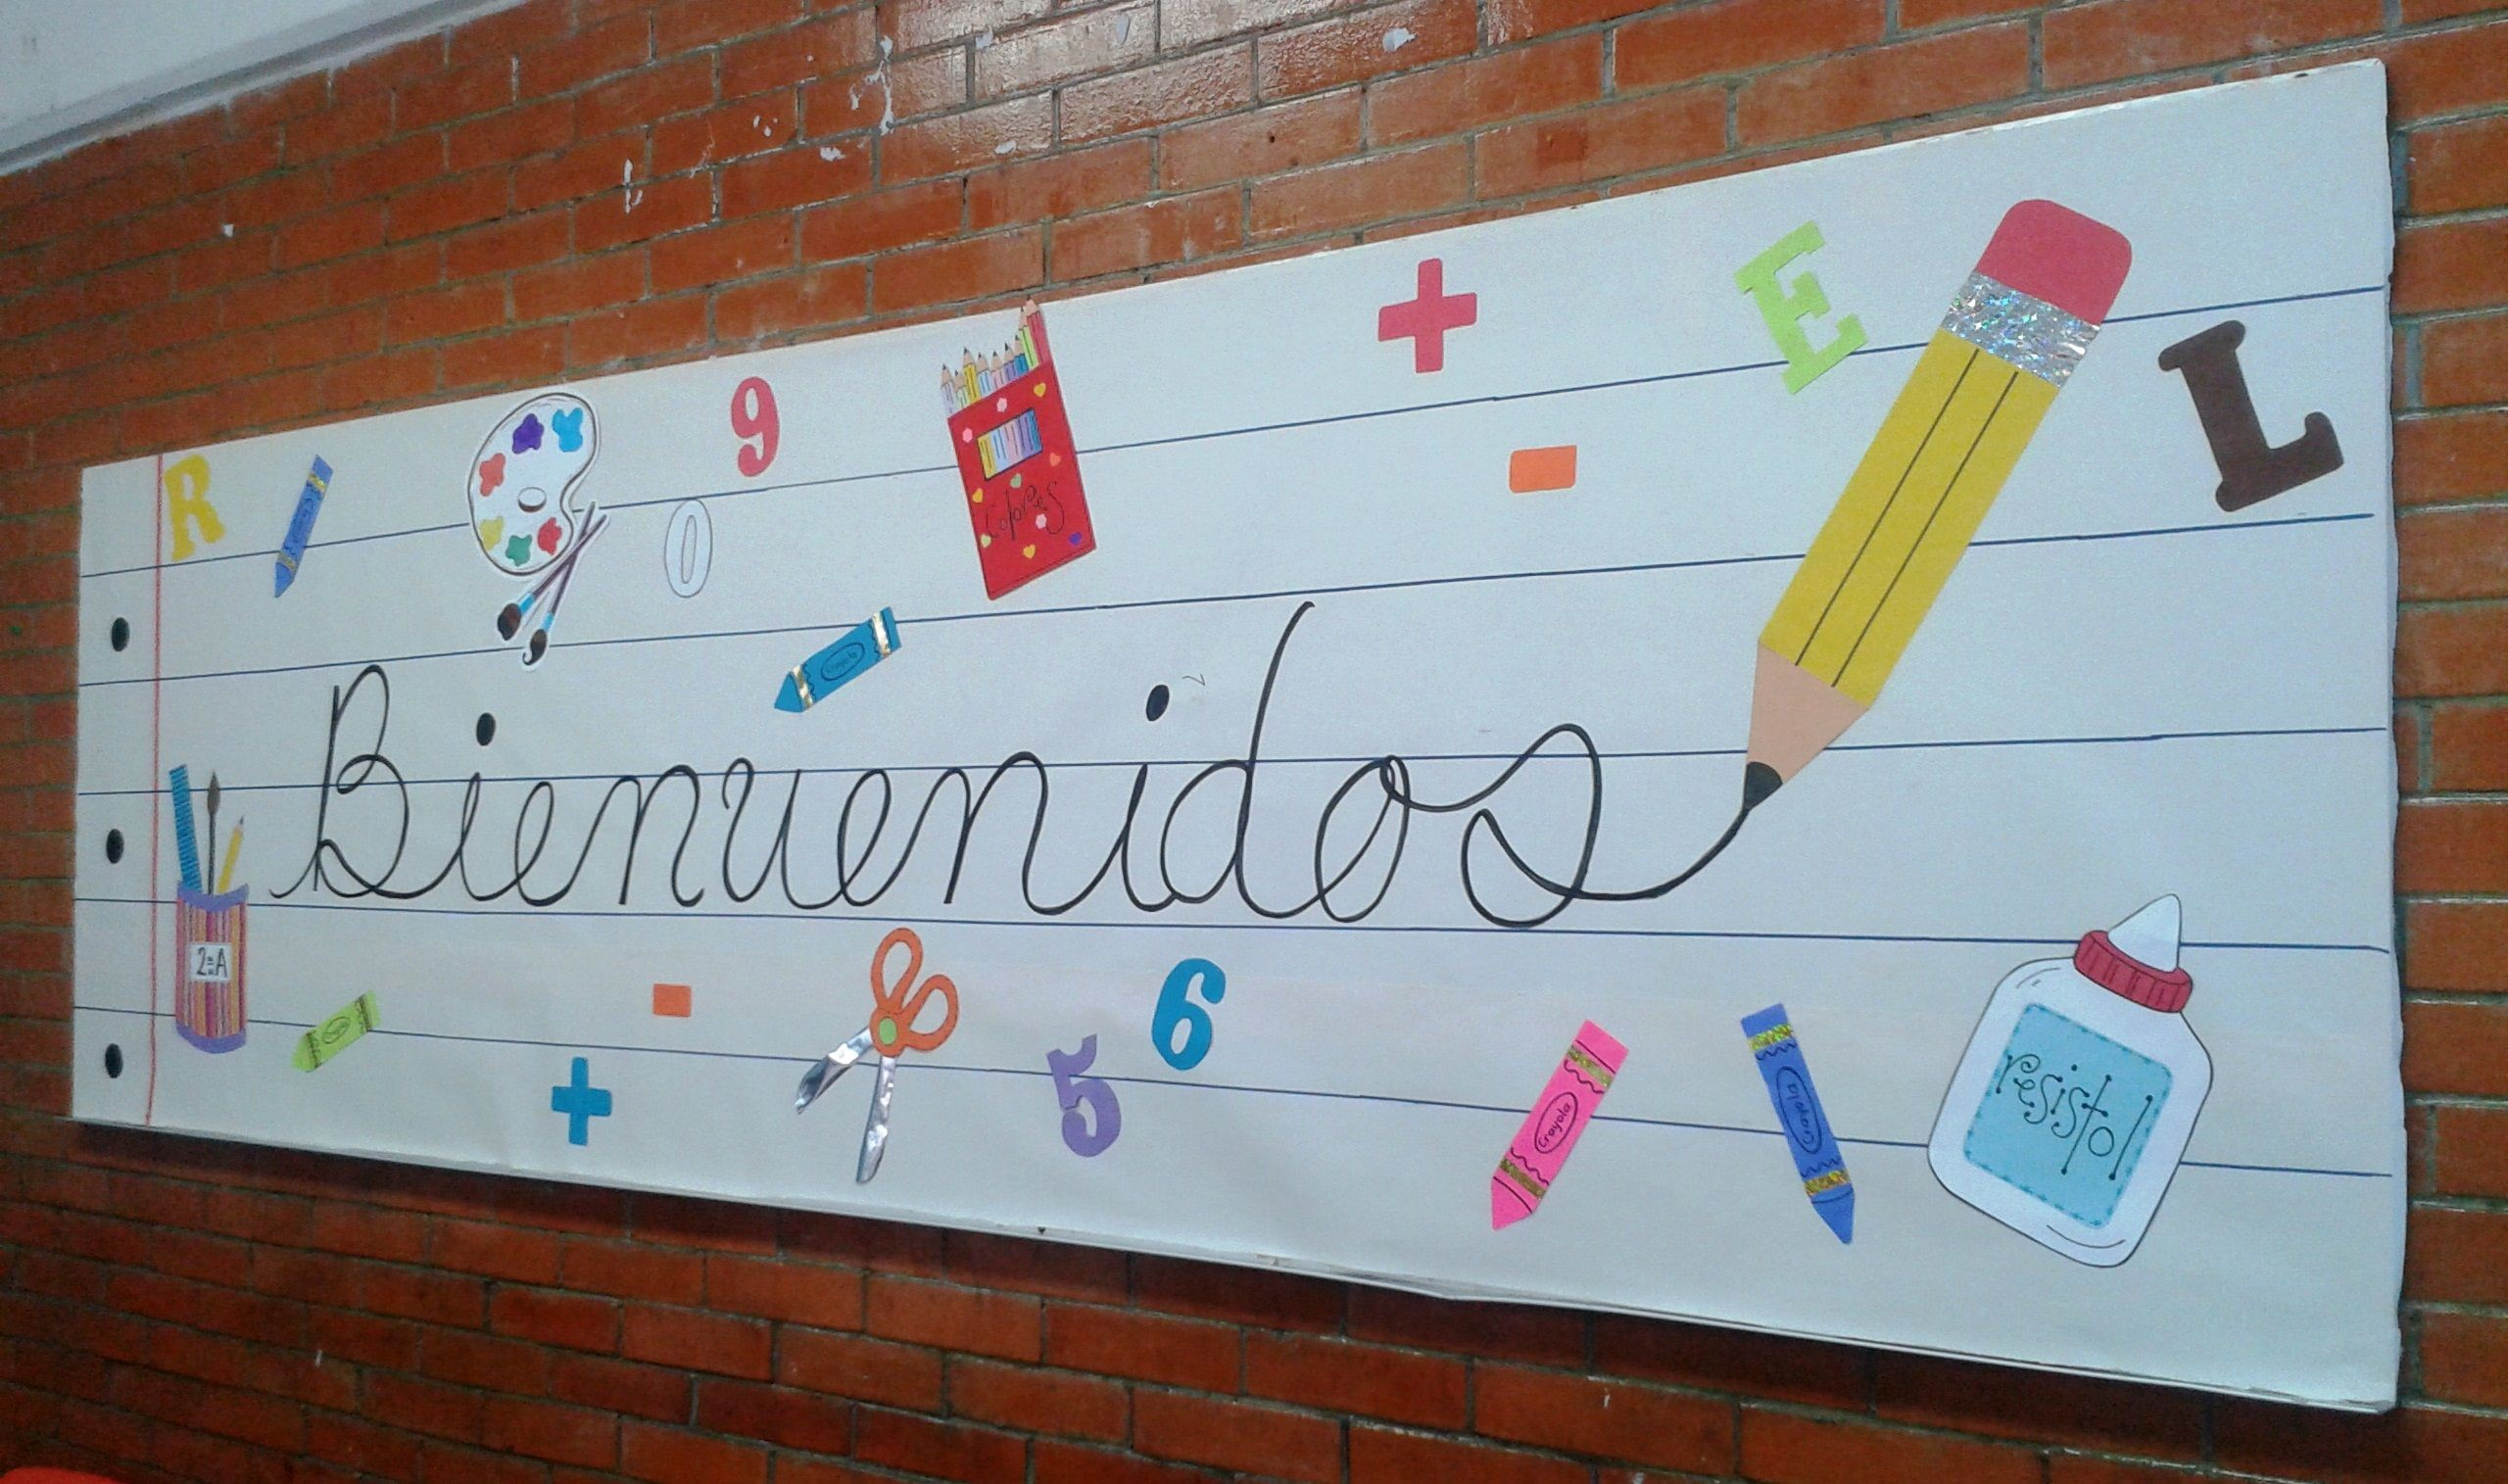 Periodico mural regreso a clases Toddler Class Classroom Design Classroom Decor First Day